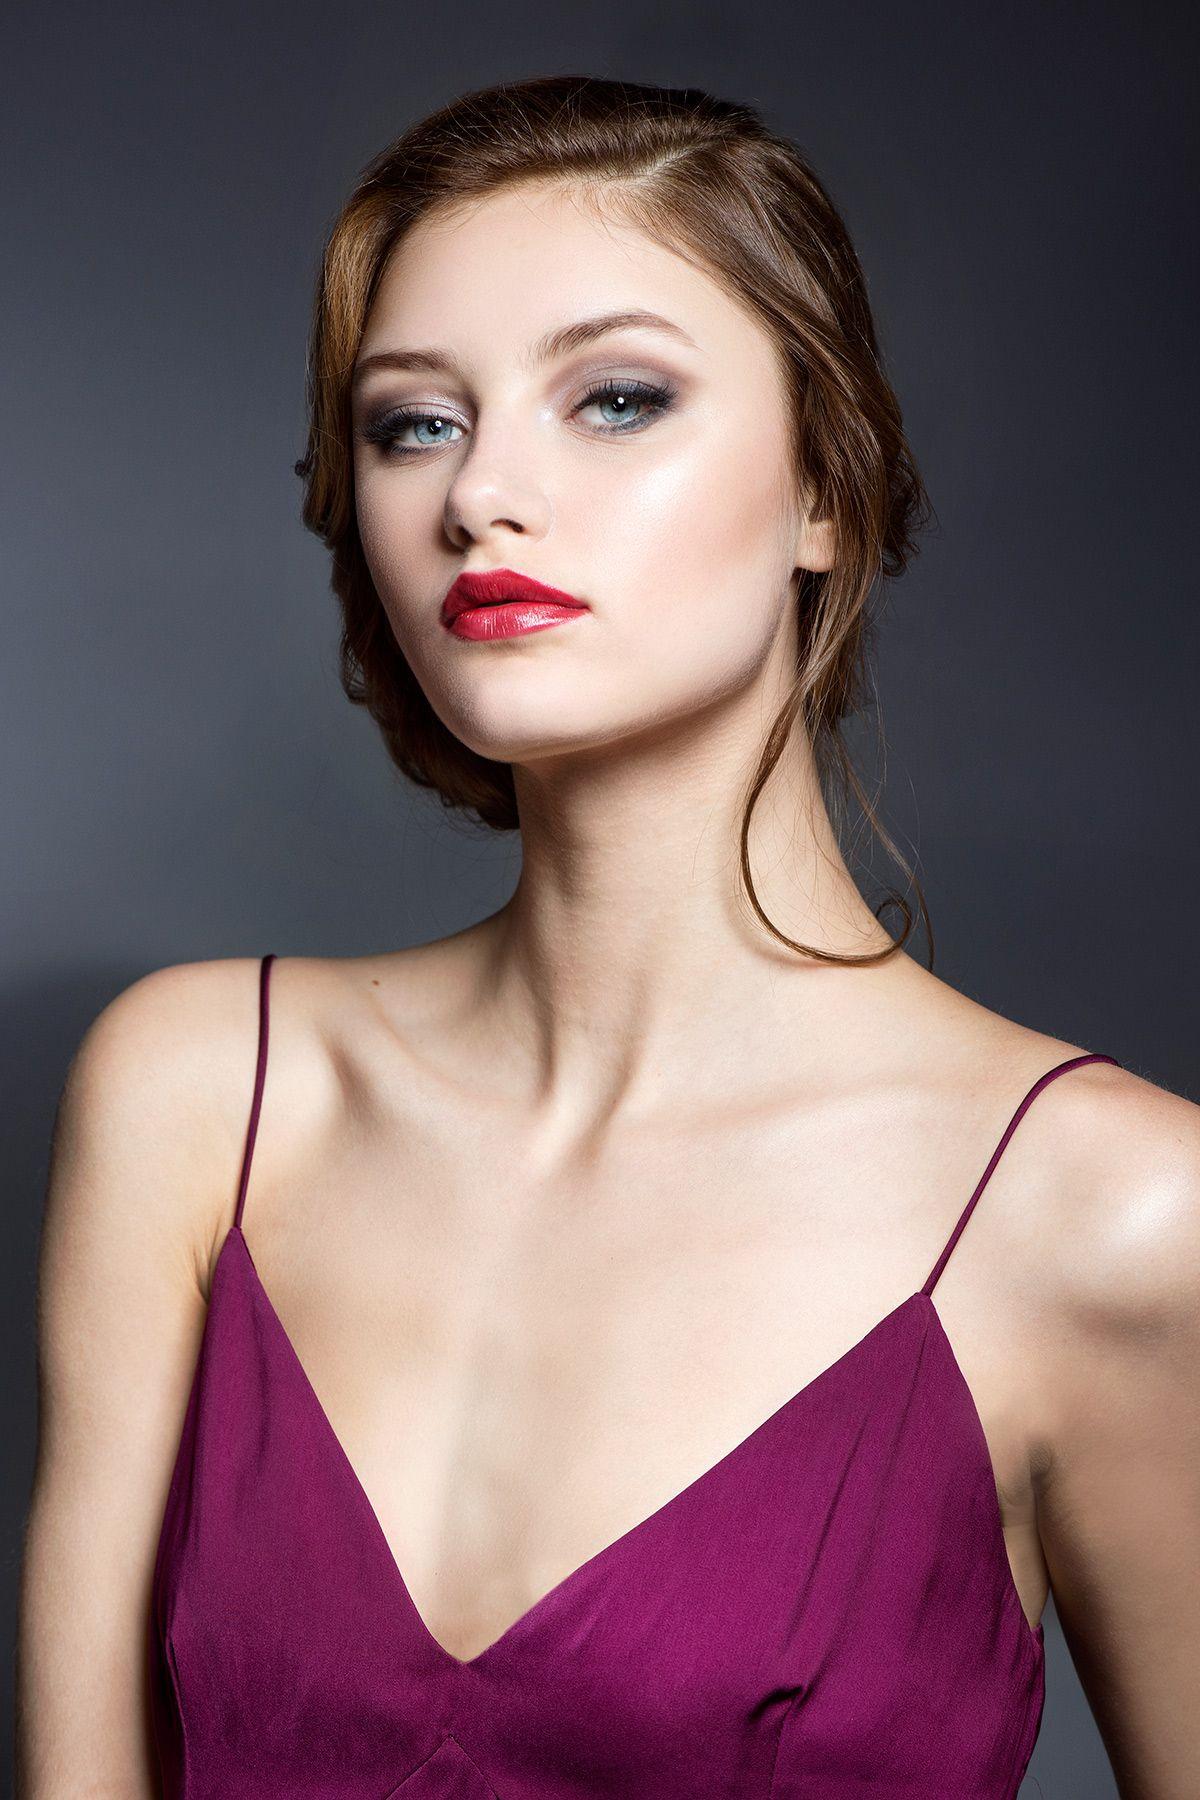 #nellybriet #photography #fashion #beauty #portrait #glamour #glamorous #redlips #violet